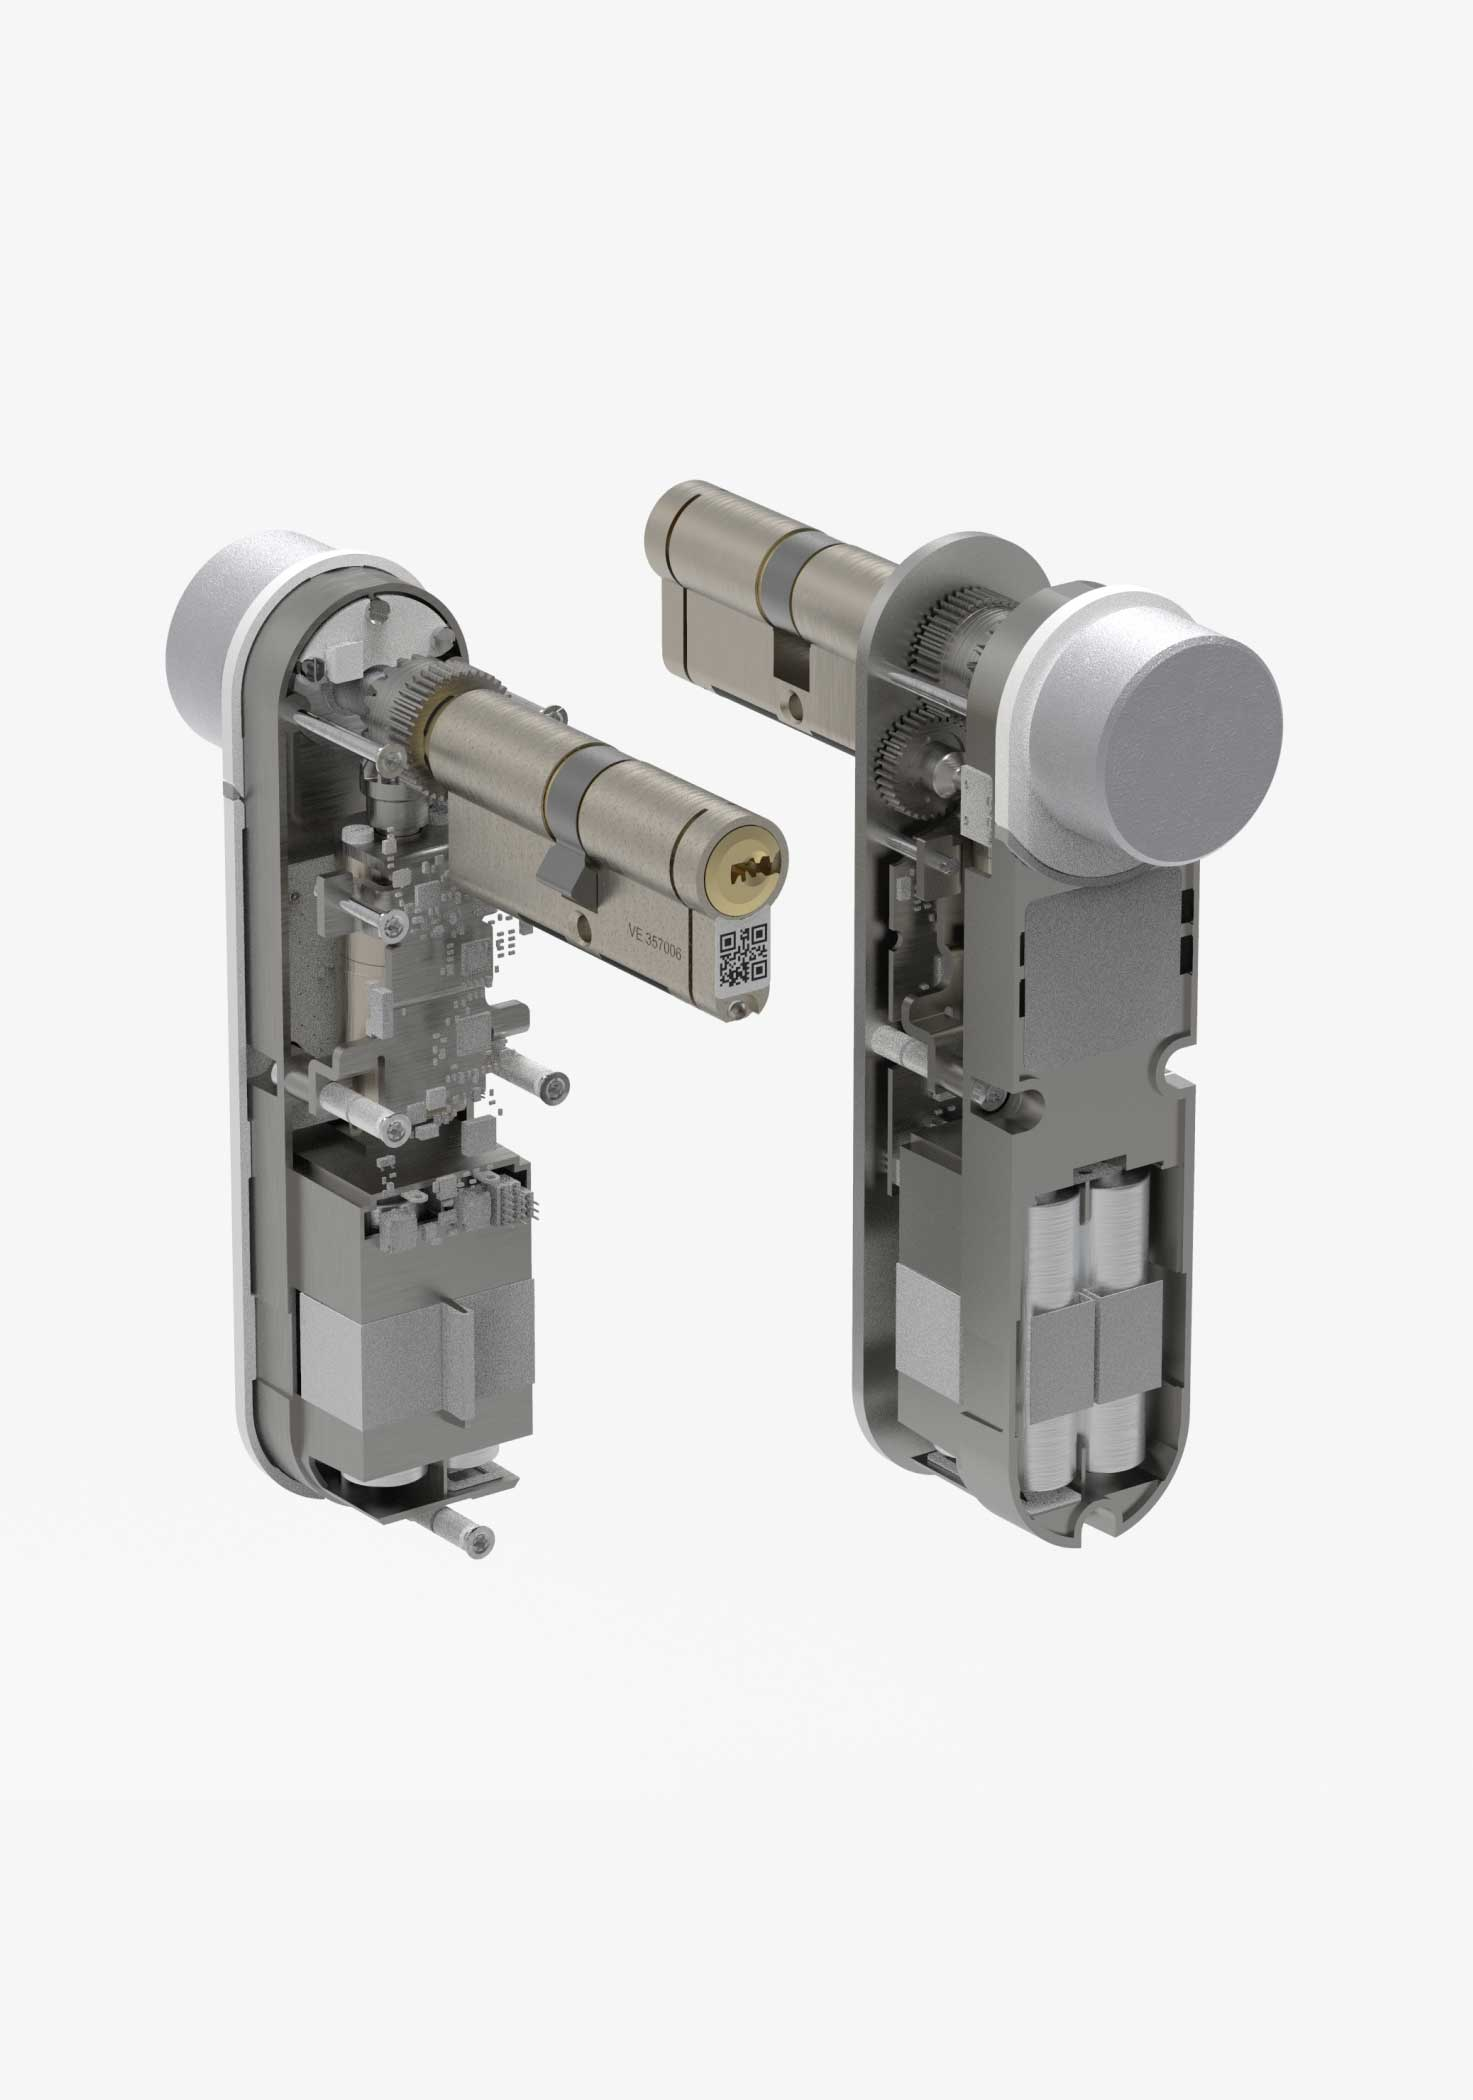 BrightLock cutaway showing mechanism